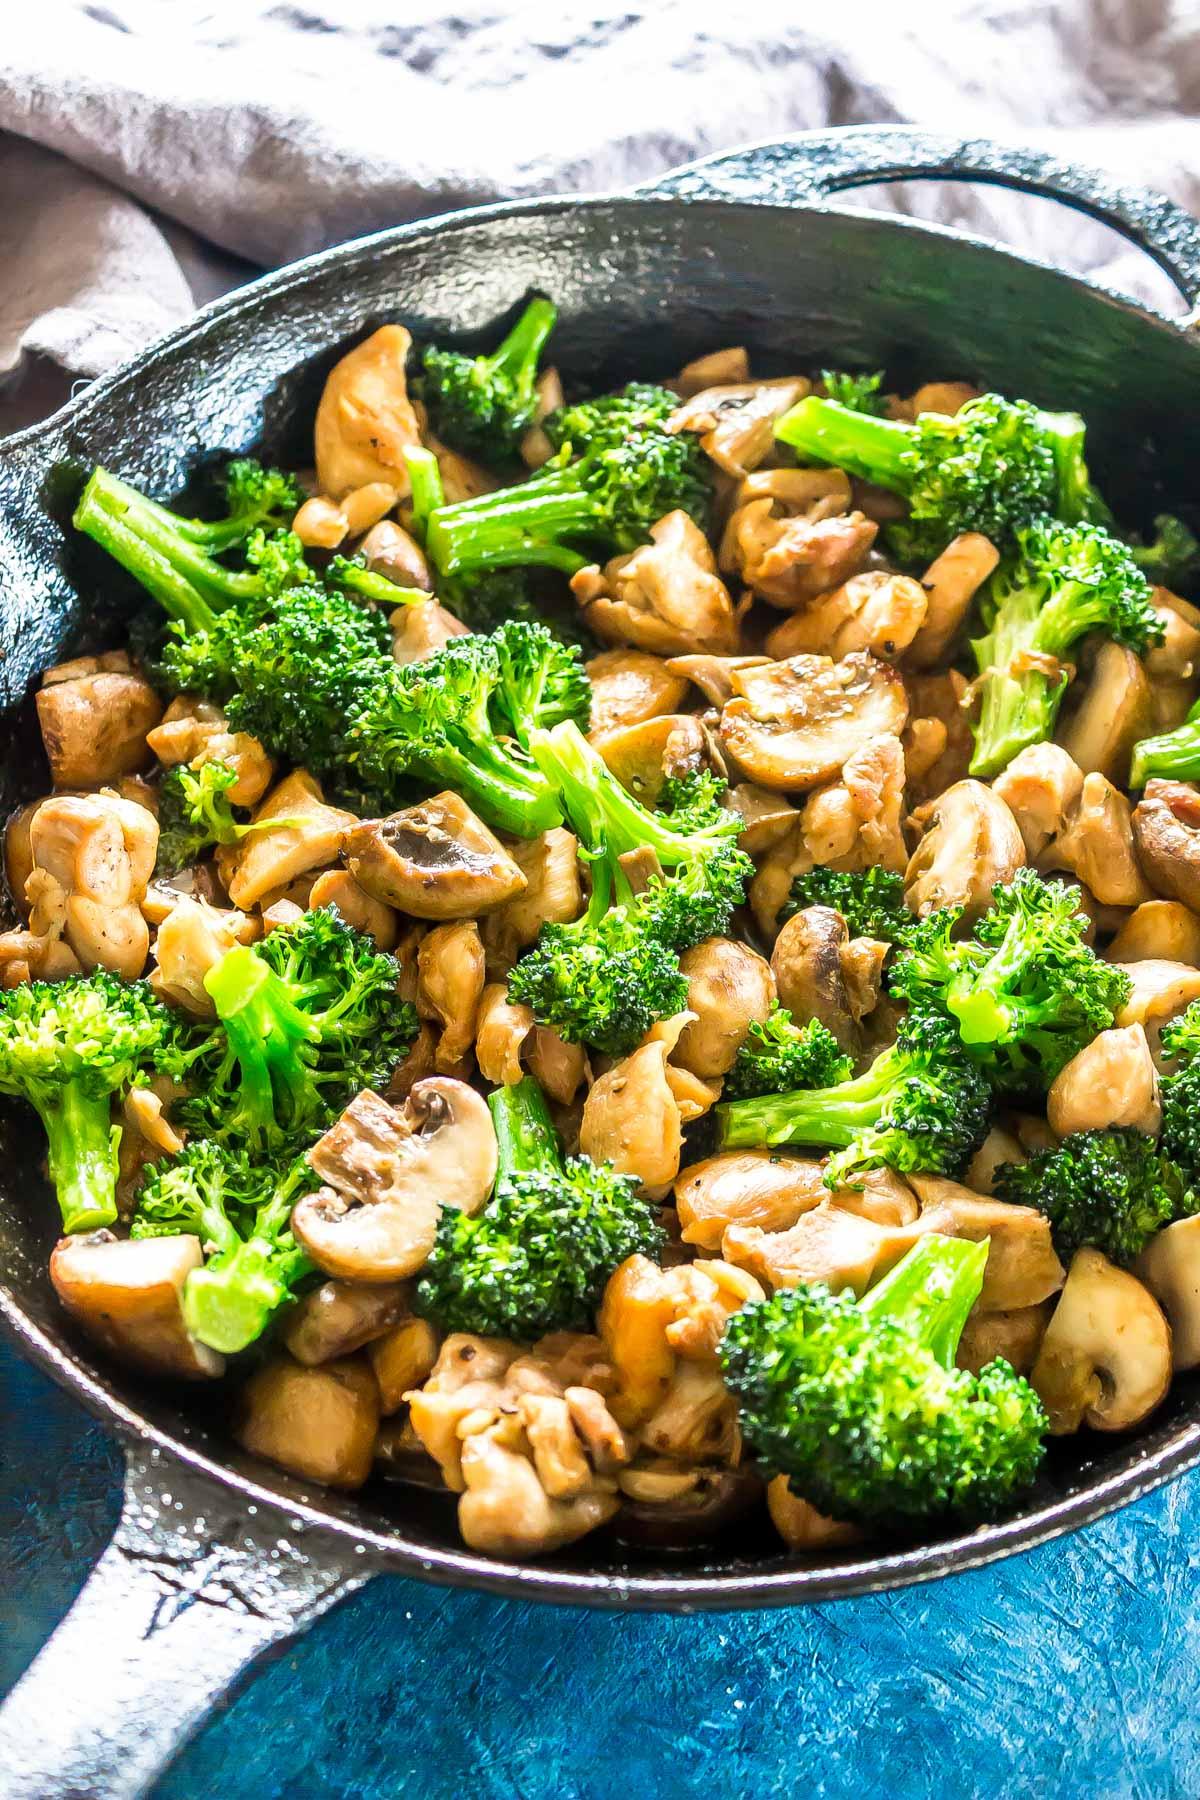 This Keto Hibachi Chicken is an easy skillet recipe that has less than 5 ingredients! #glutenfree #ketorecipe #ketodiet #keto #lchf #lowcarbrecipe #lowcarbdiet #easyrecipe